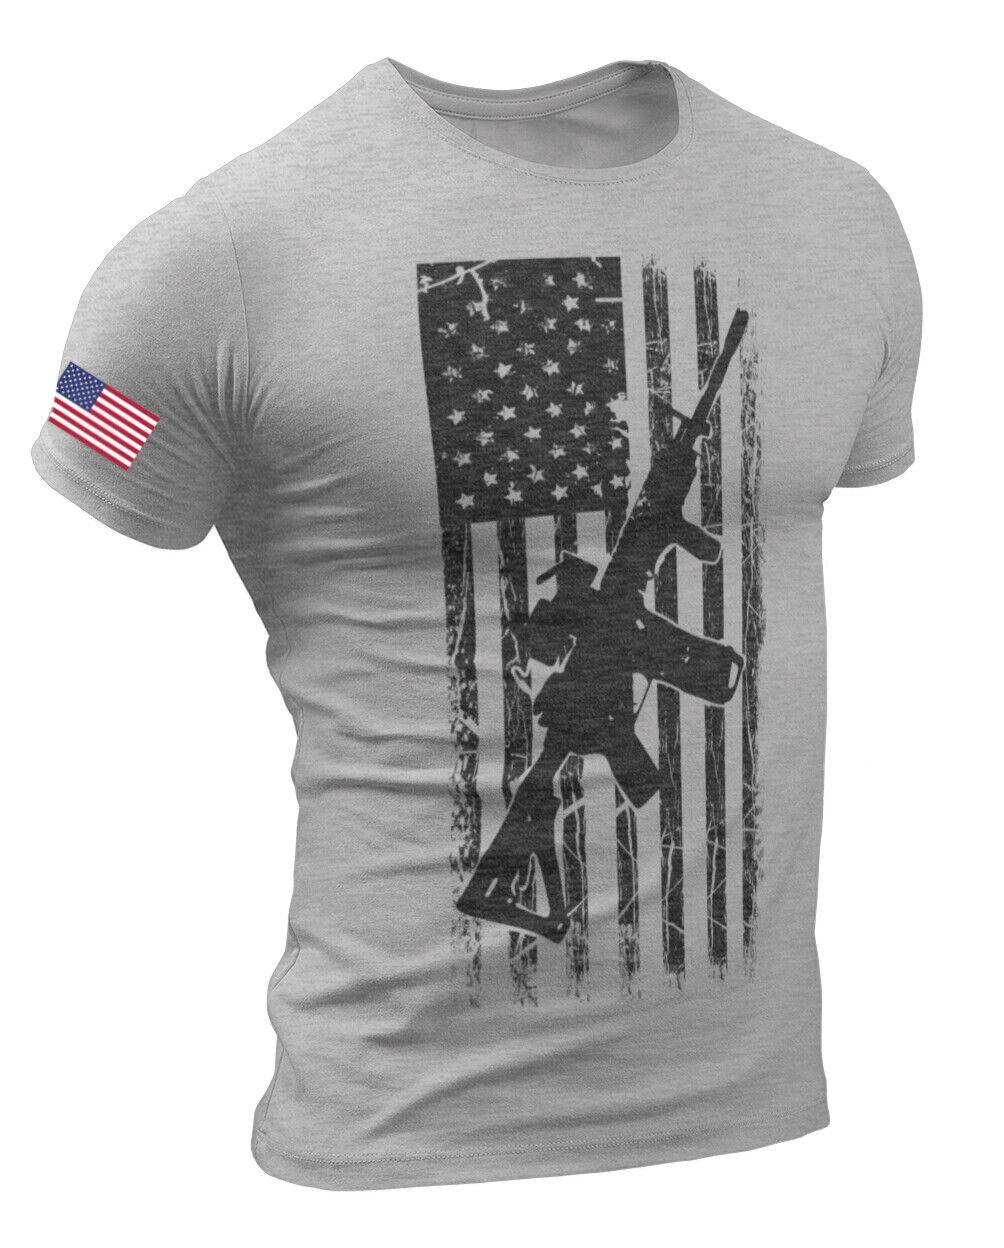 America Gun Flag Men's T Shirt Rifle Flag USA Warrior Military Style T-shirt